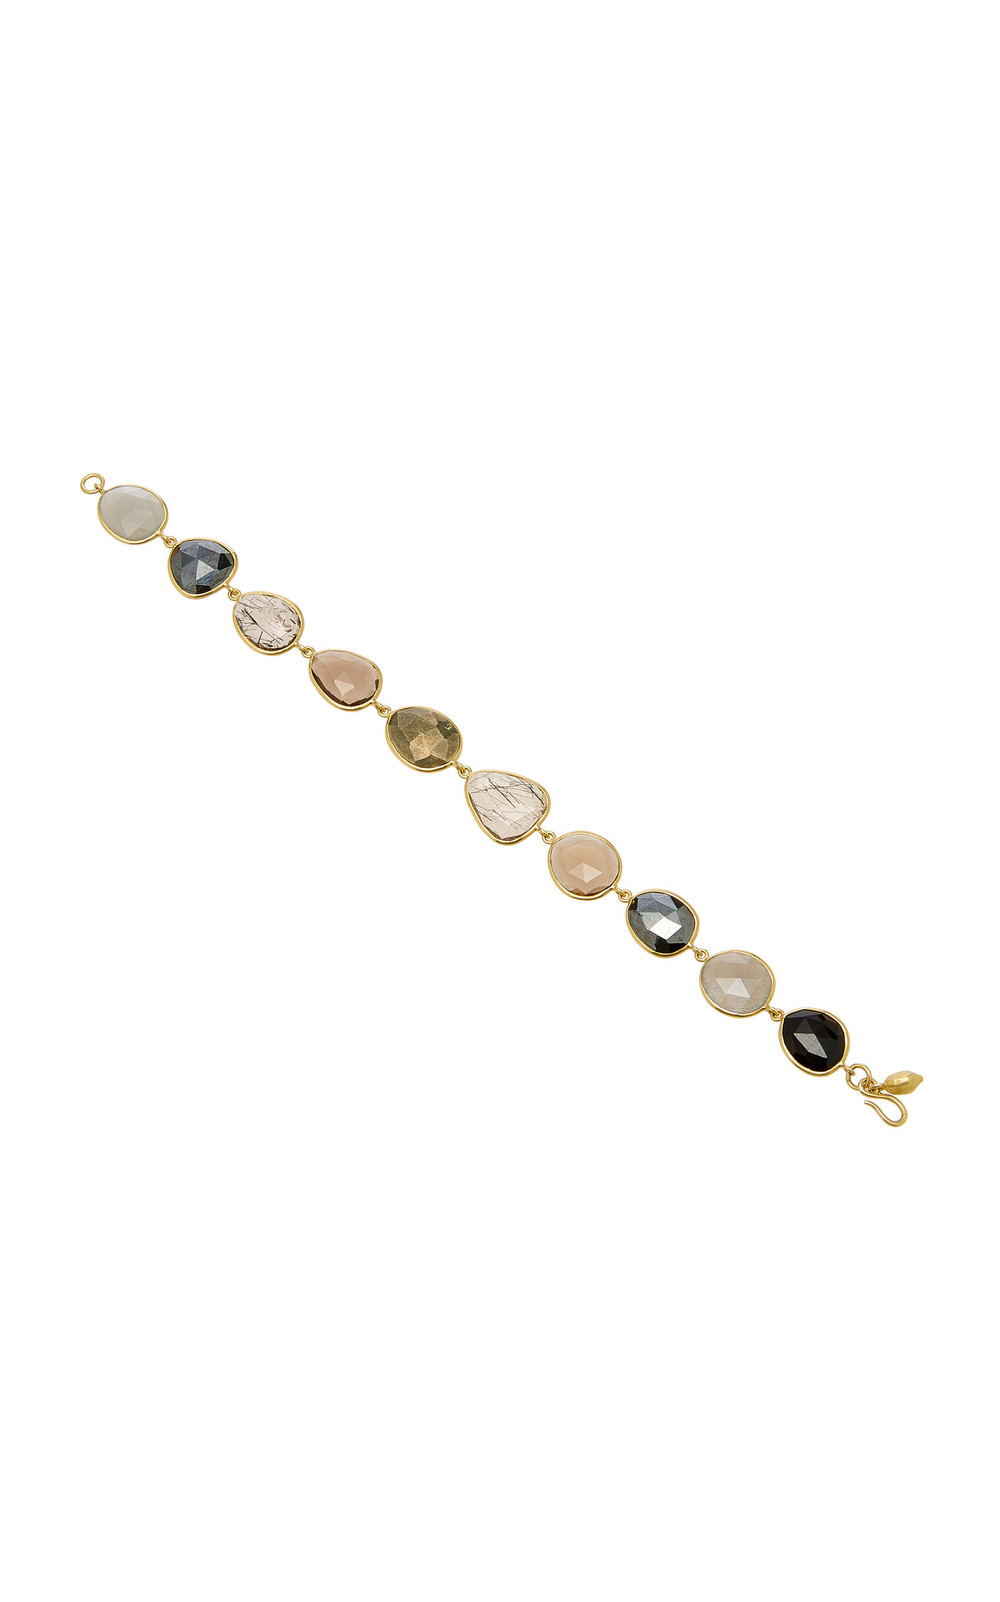 Pippa Small Meteor Shower Full Stone Bracelet in grey